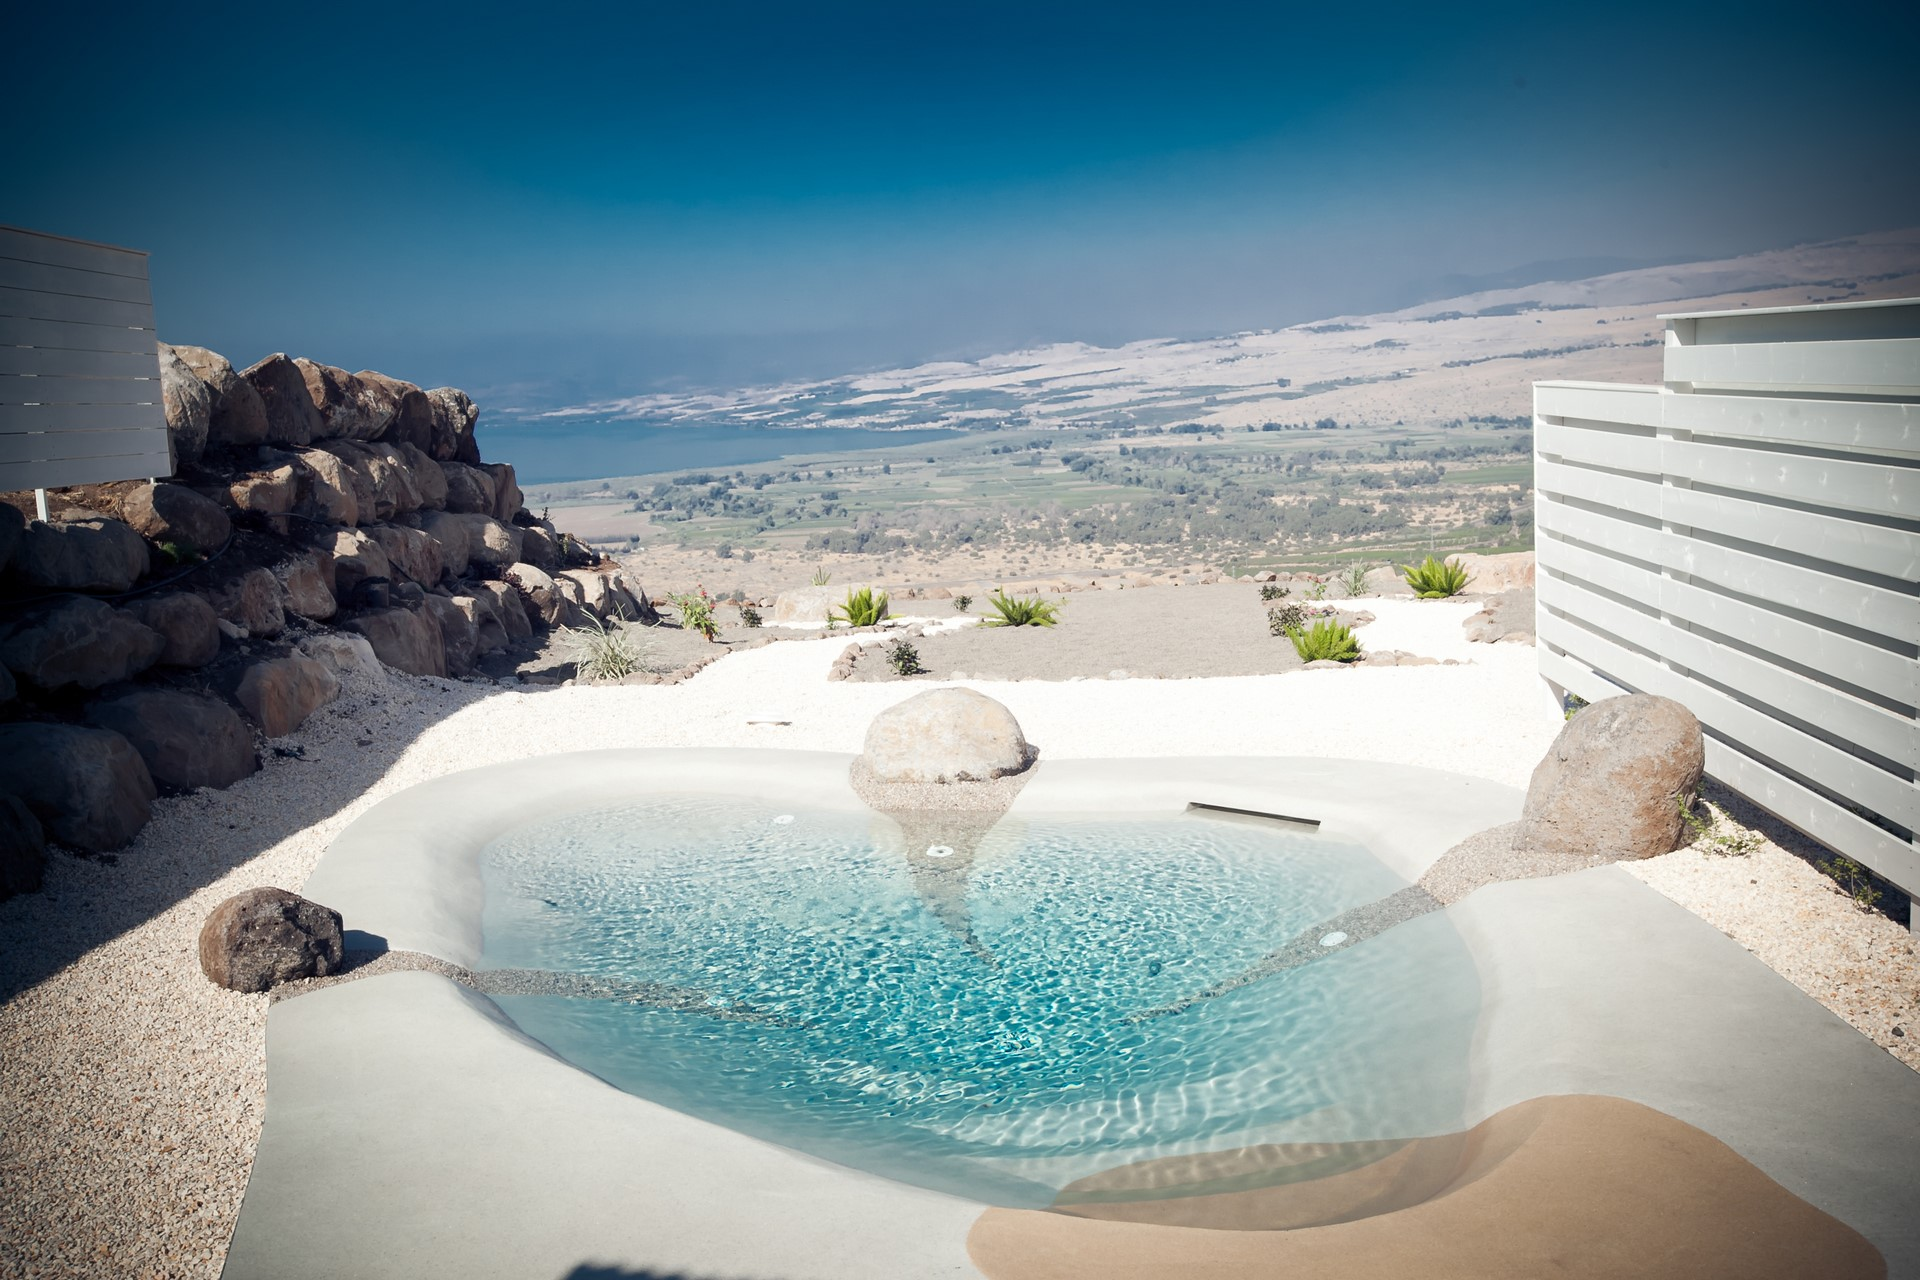 Gallery private swimming pools piscine bio design for Private gallery pattern